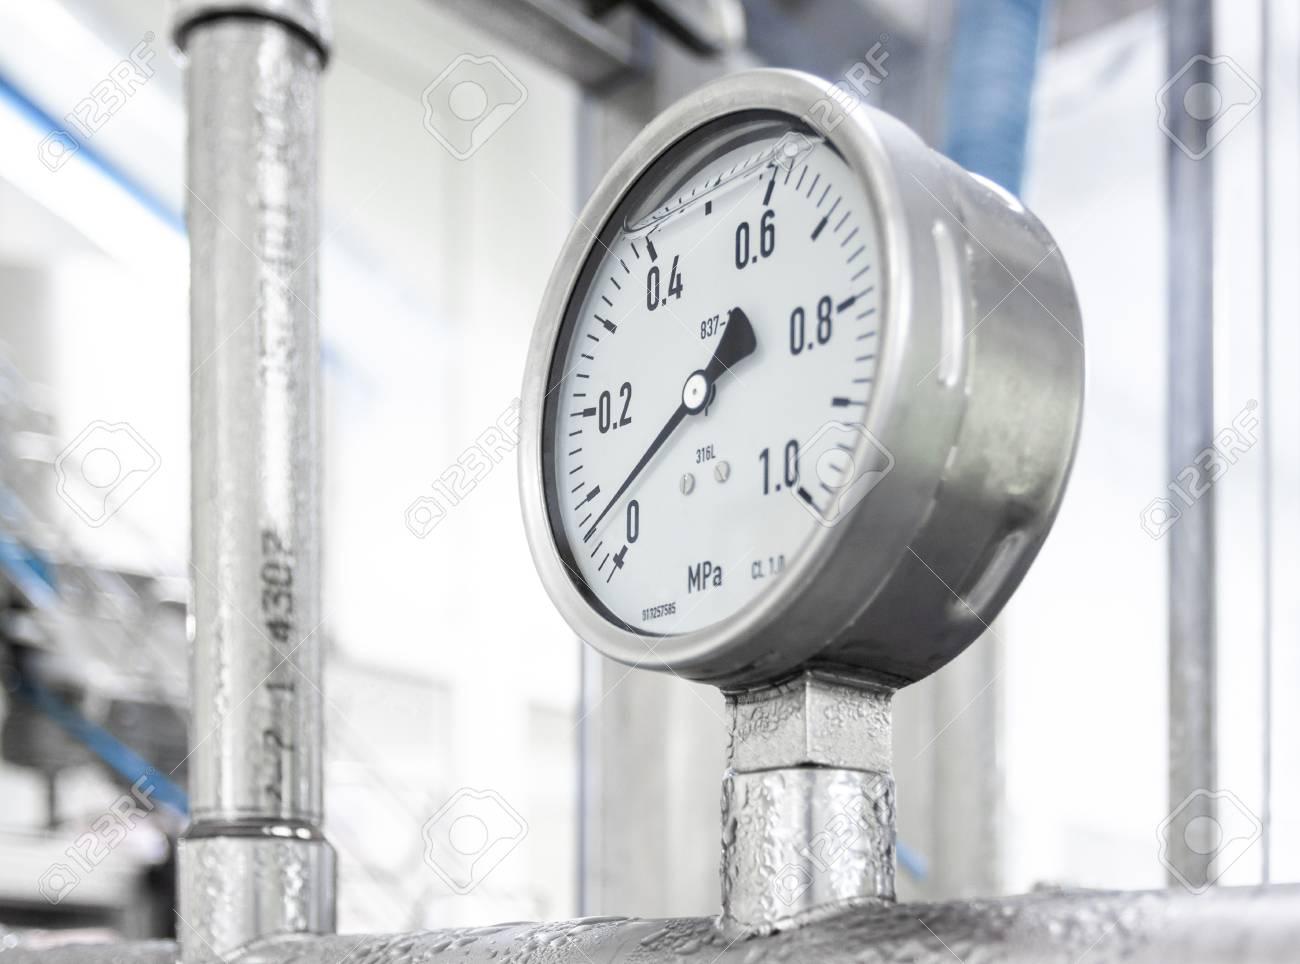 Industrial device of measurement of pressure - manometer - 118894018